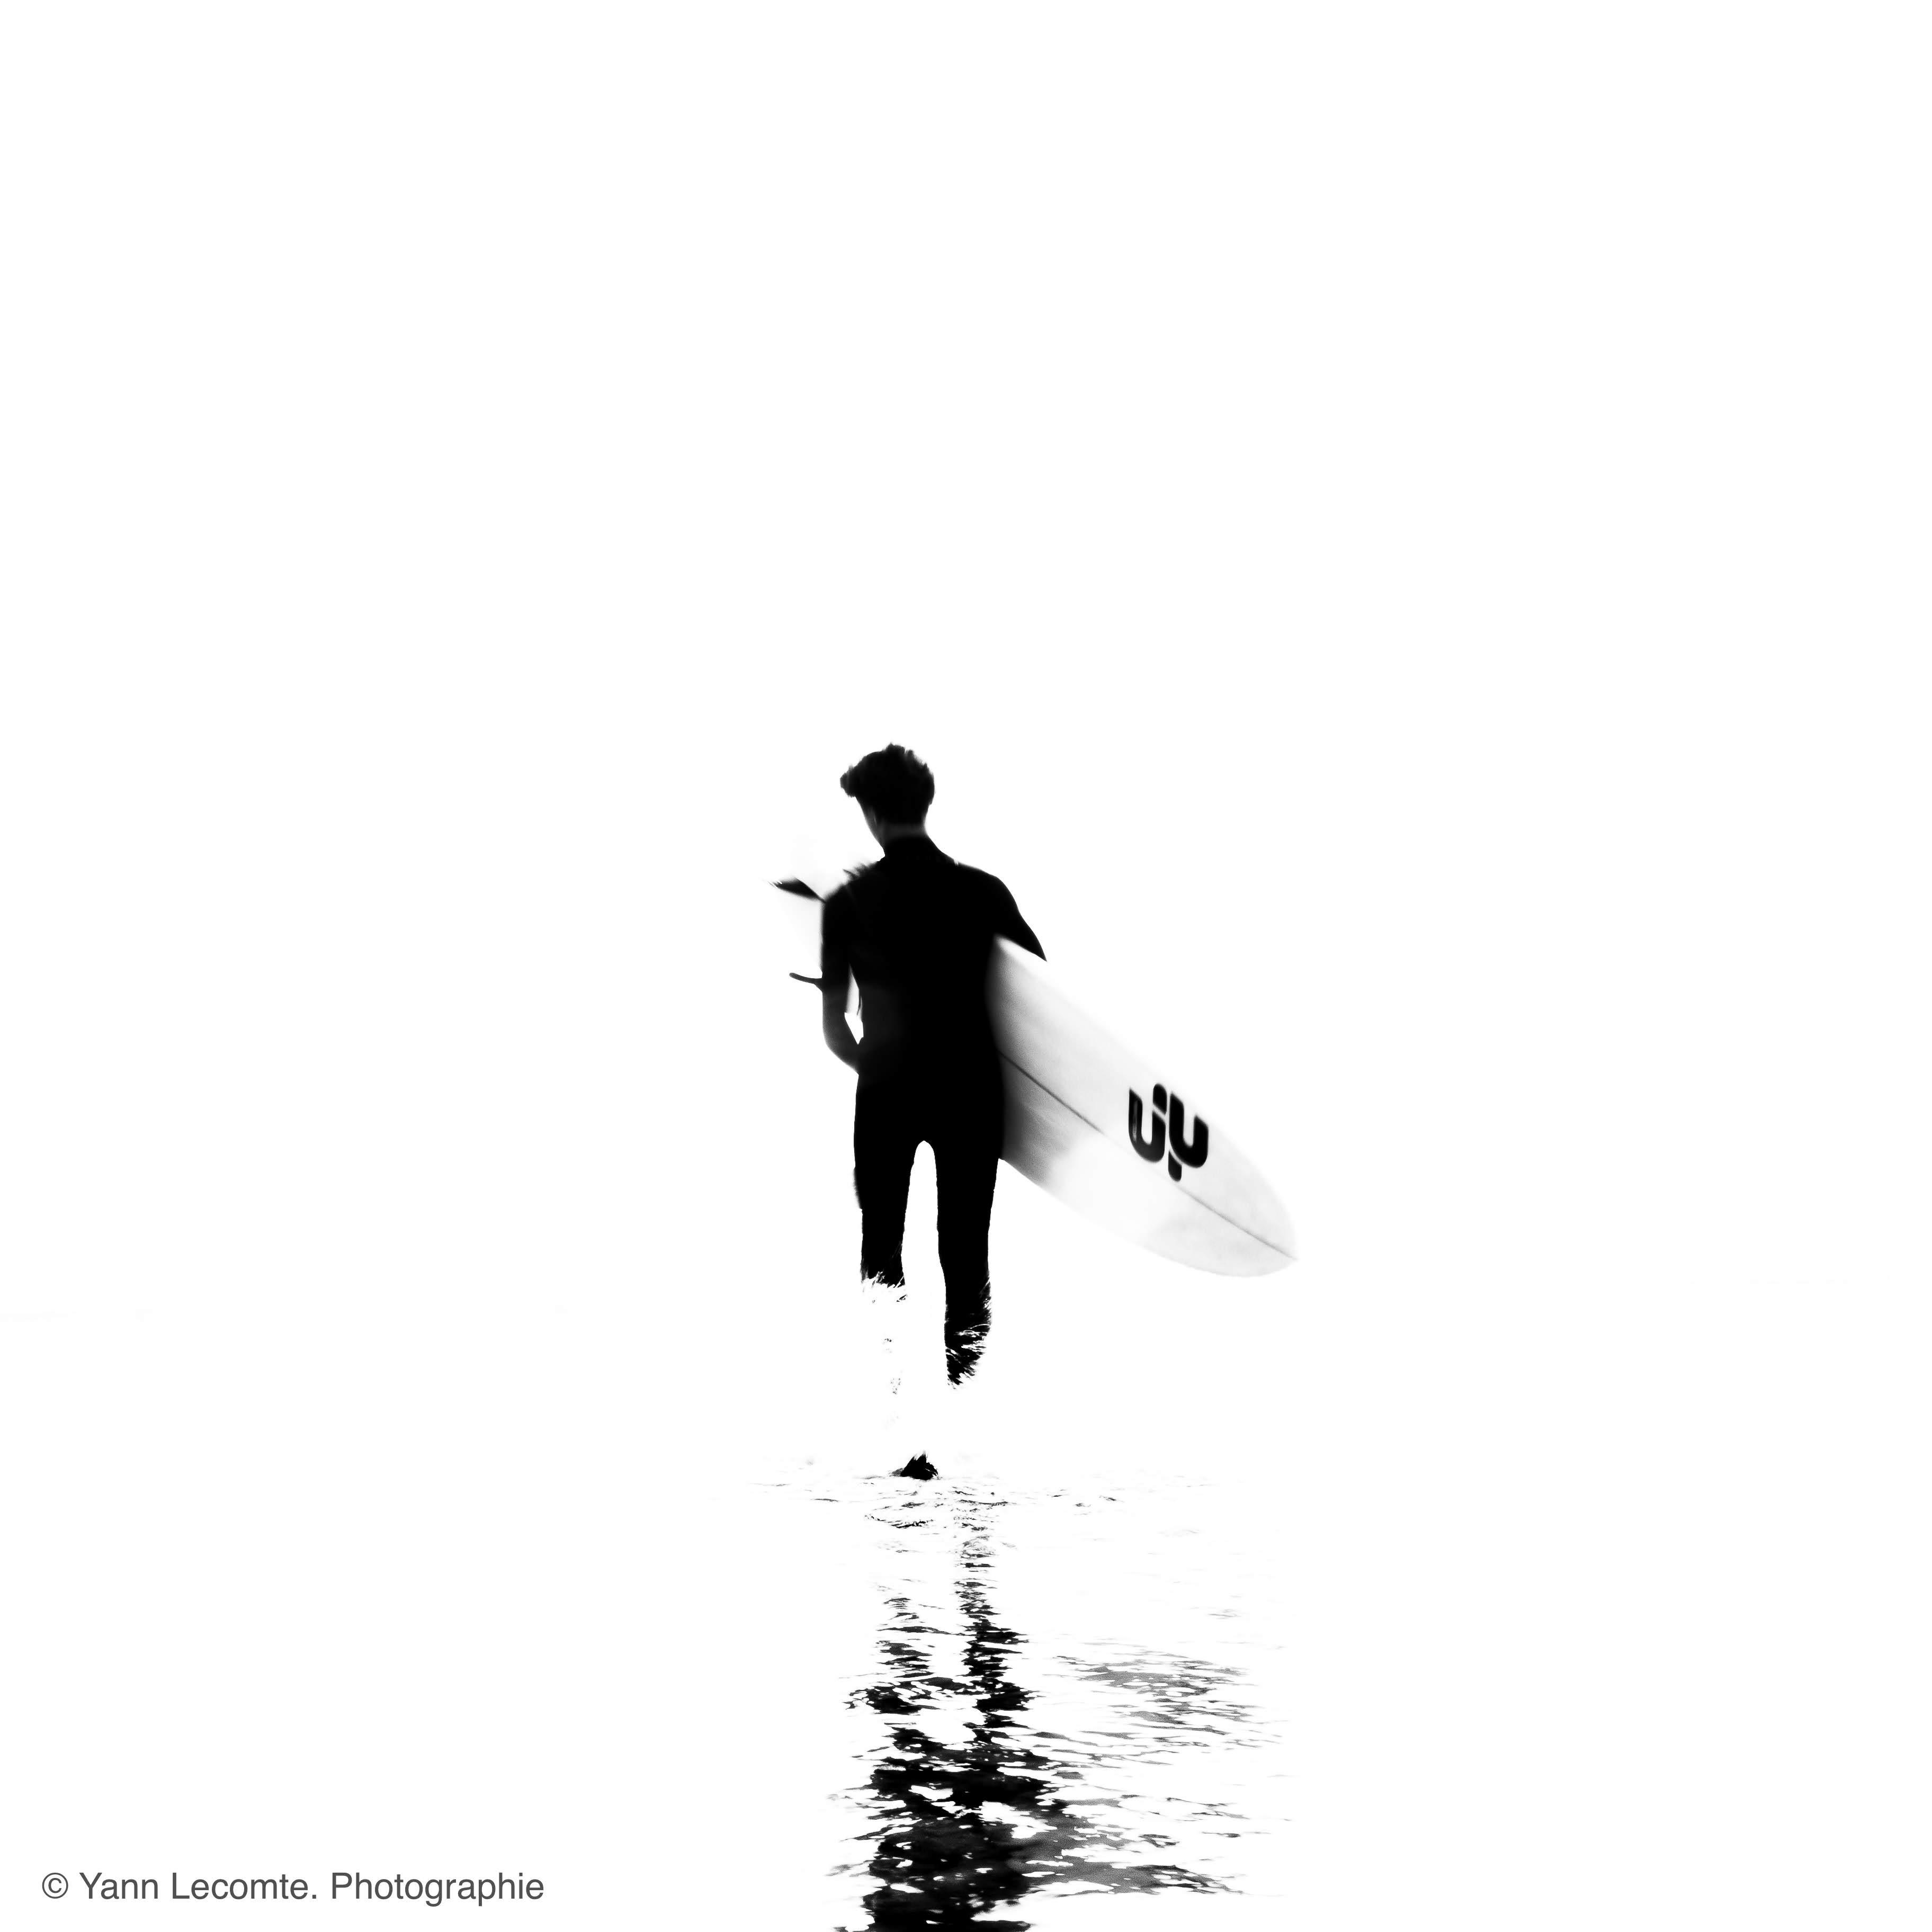 photos yann lecomte les sables